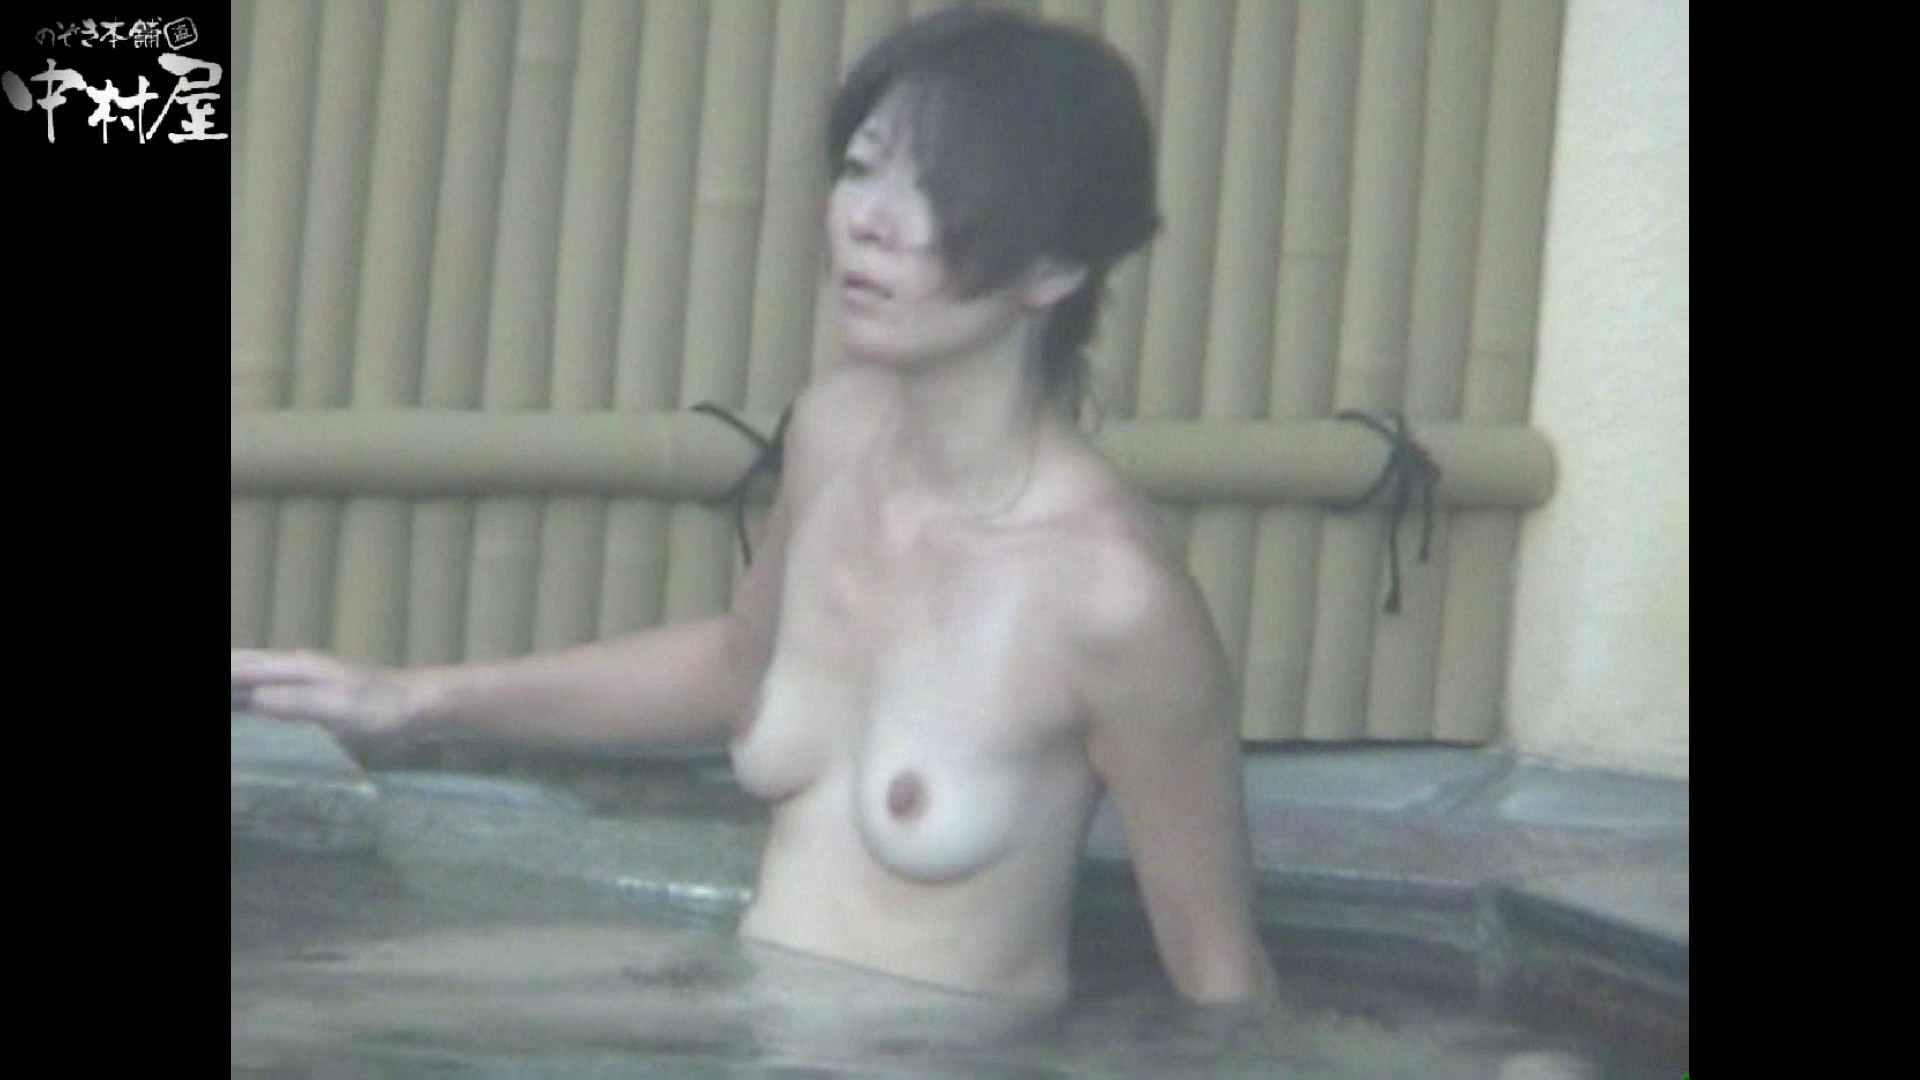 Aquaな露天風呂Vol.972 盗撮 おまんこ動画流出 80画像 17